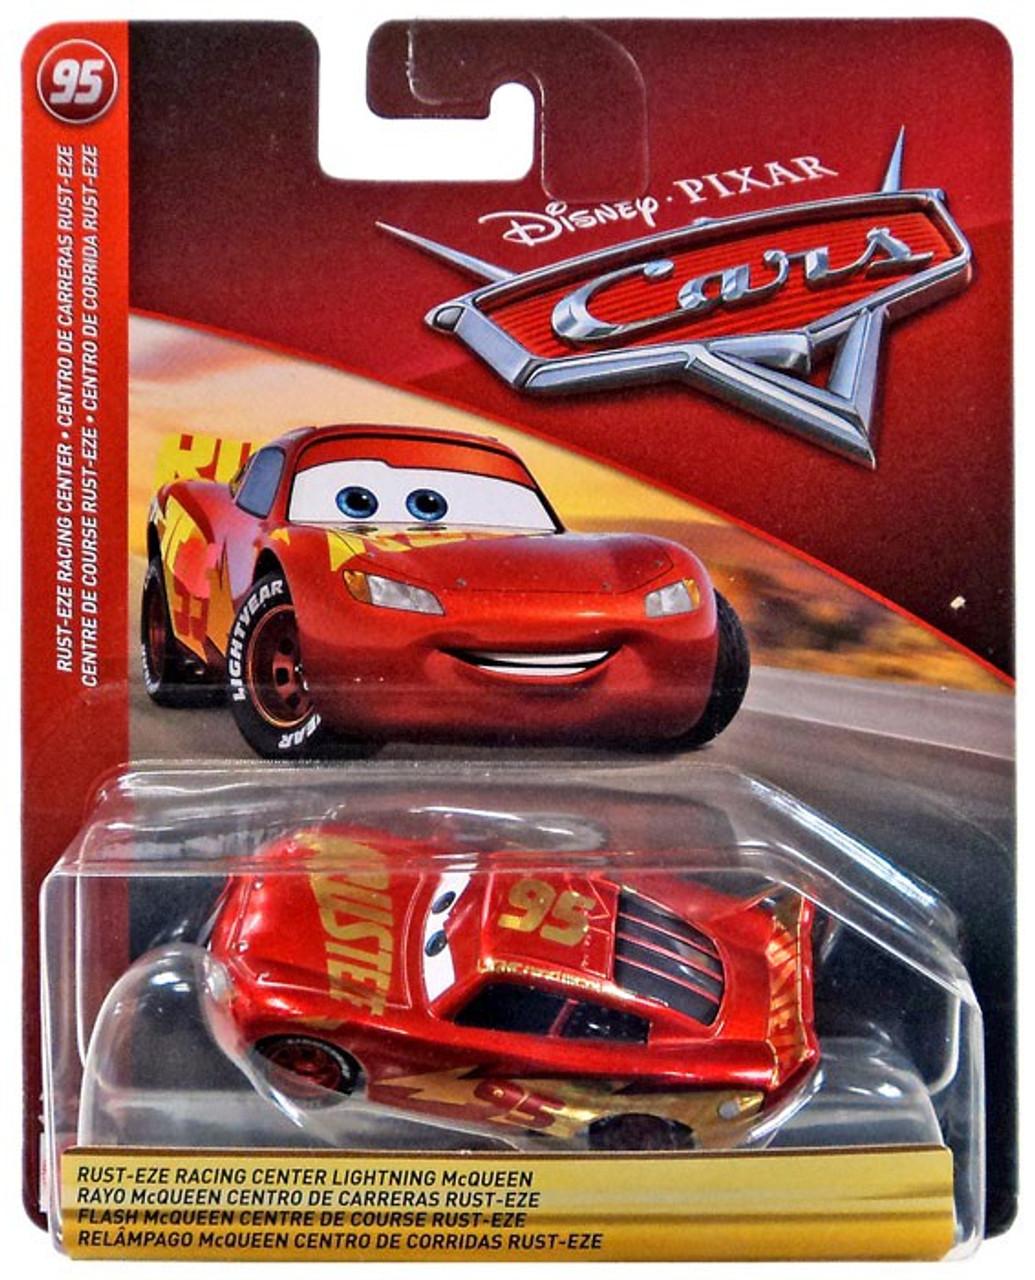 disney pixar cars cars 3 rust eze racing center lightning mcqueen 155 diecast car no card mattel. Black Bedroom Furniture Sets. Home Design Ideas